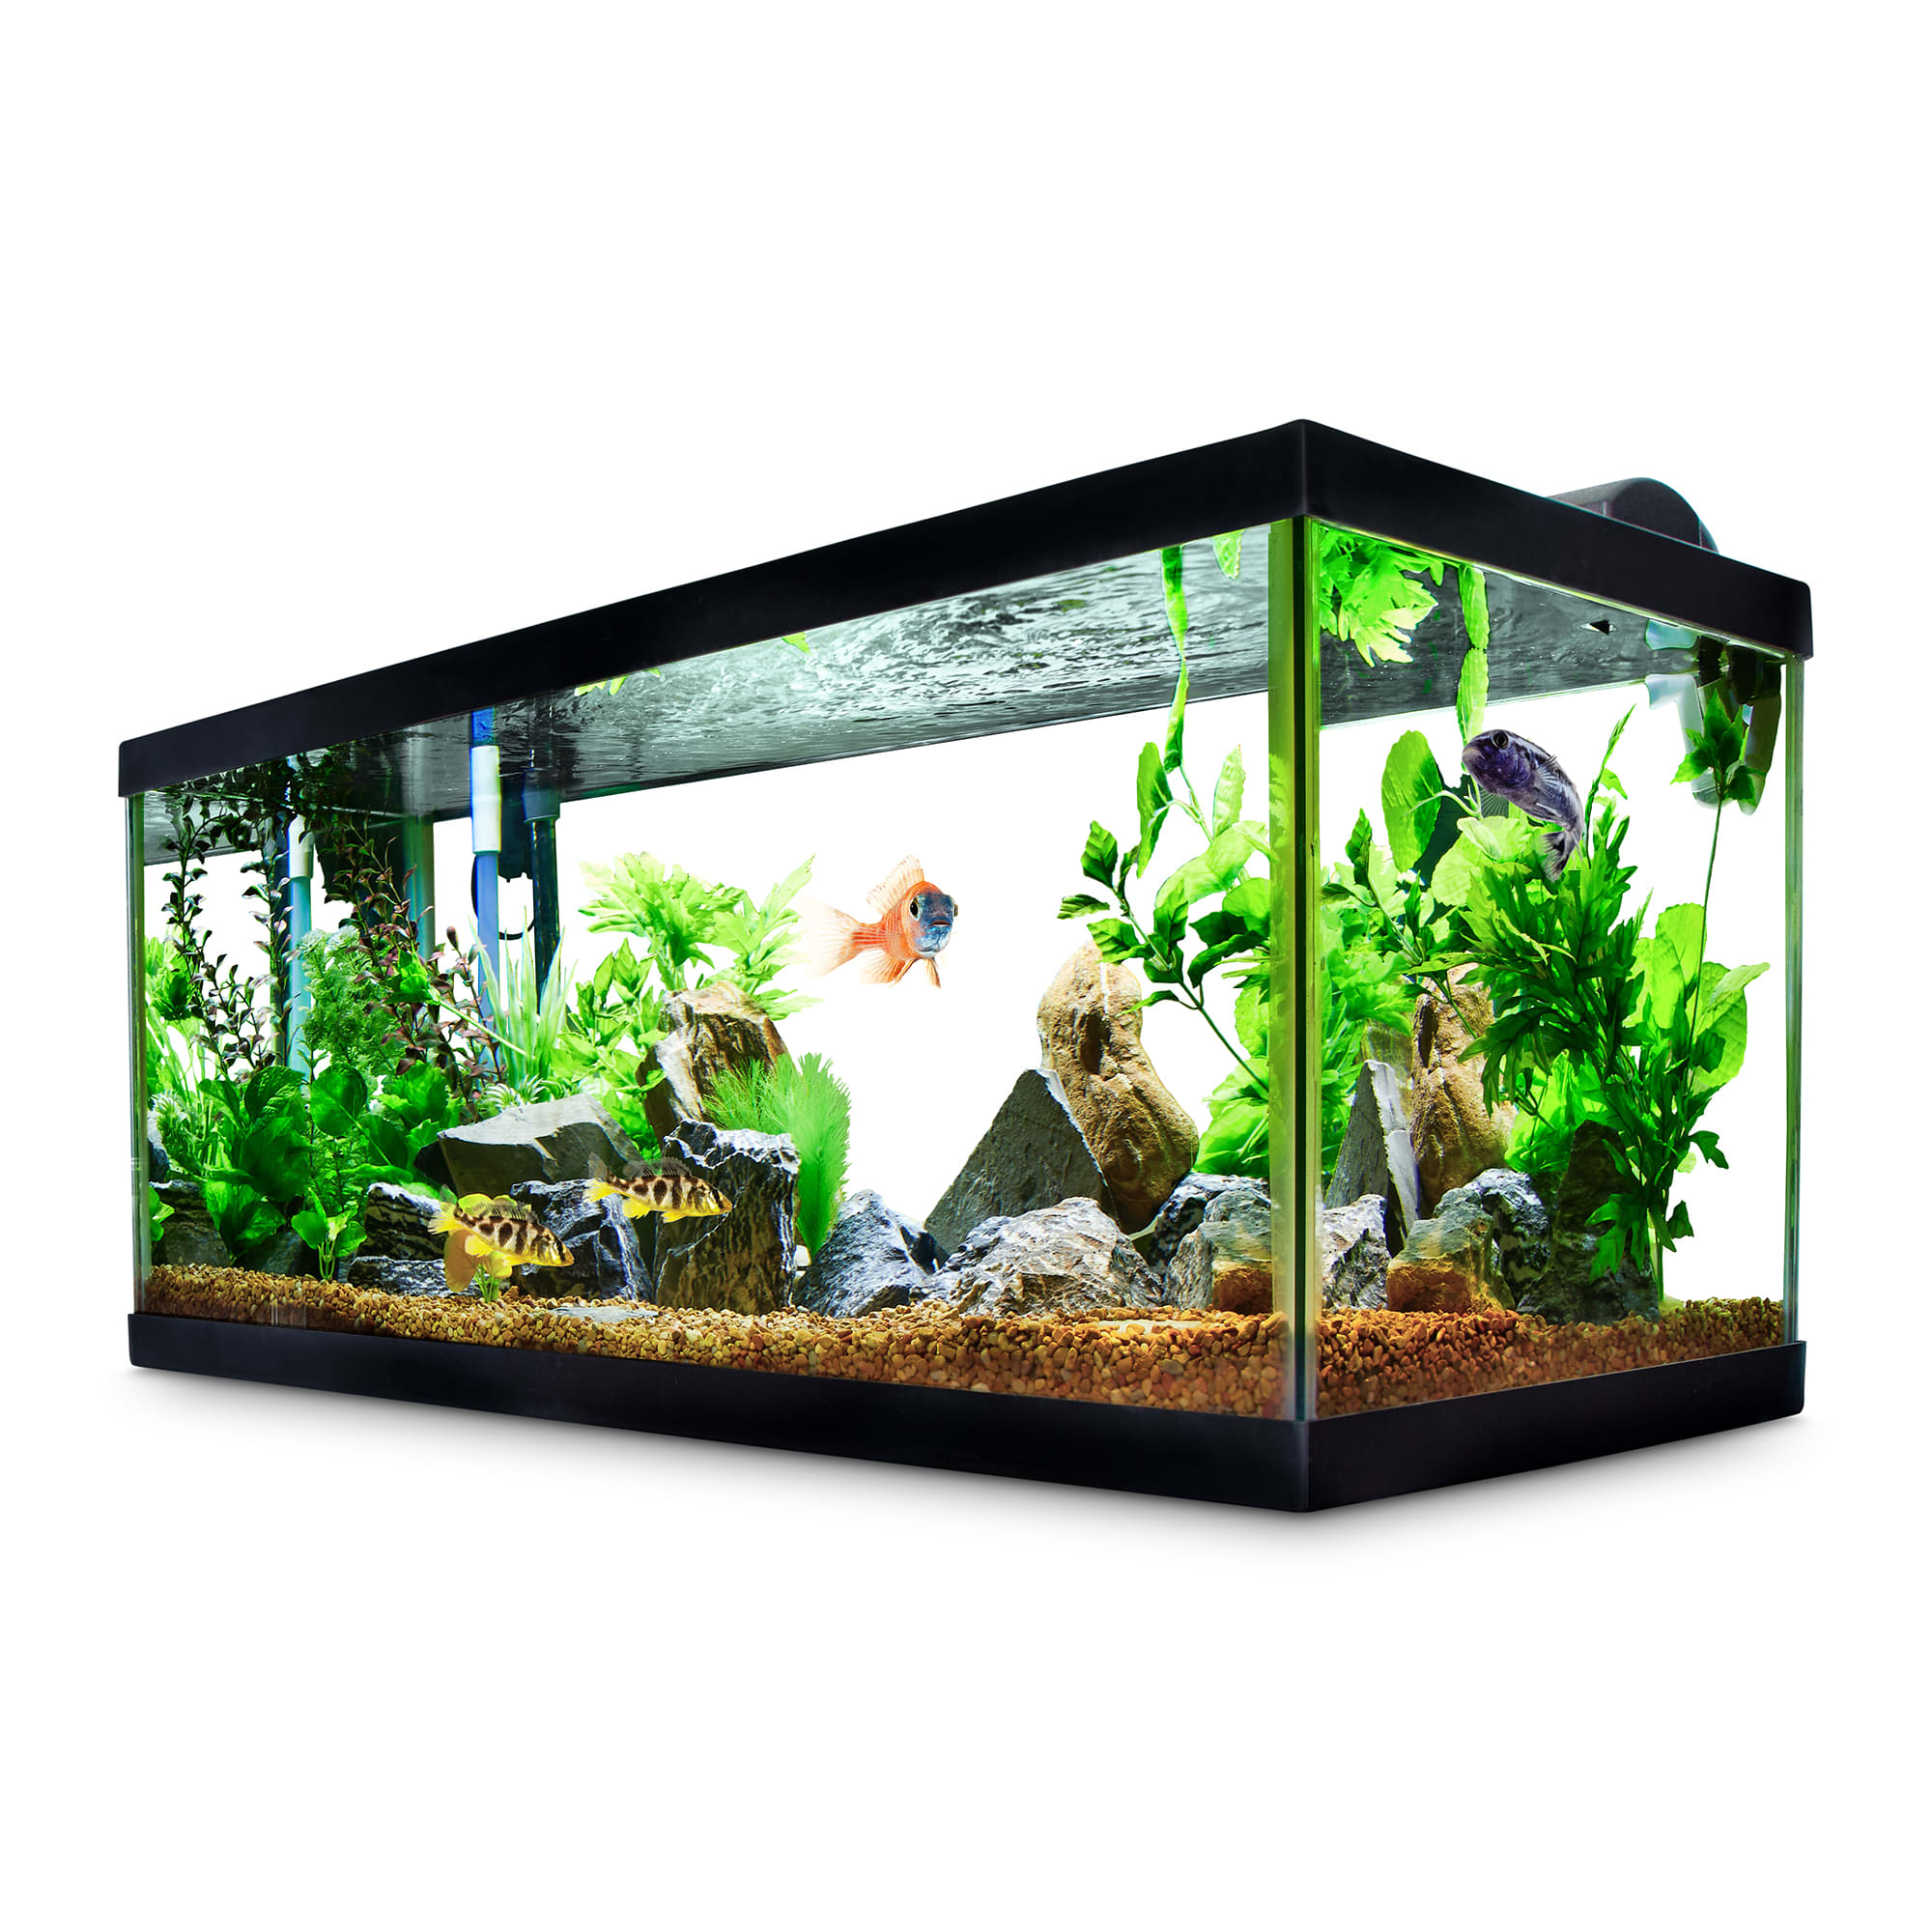 Aqueon Standard Glass Aquarium Tank 40 Gallon Breeder | Petco